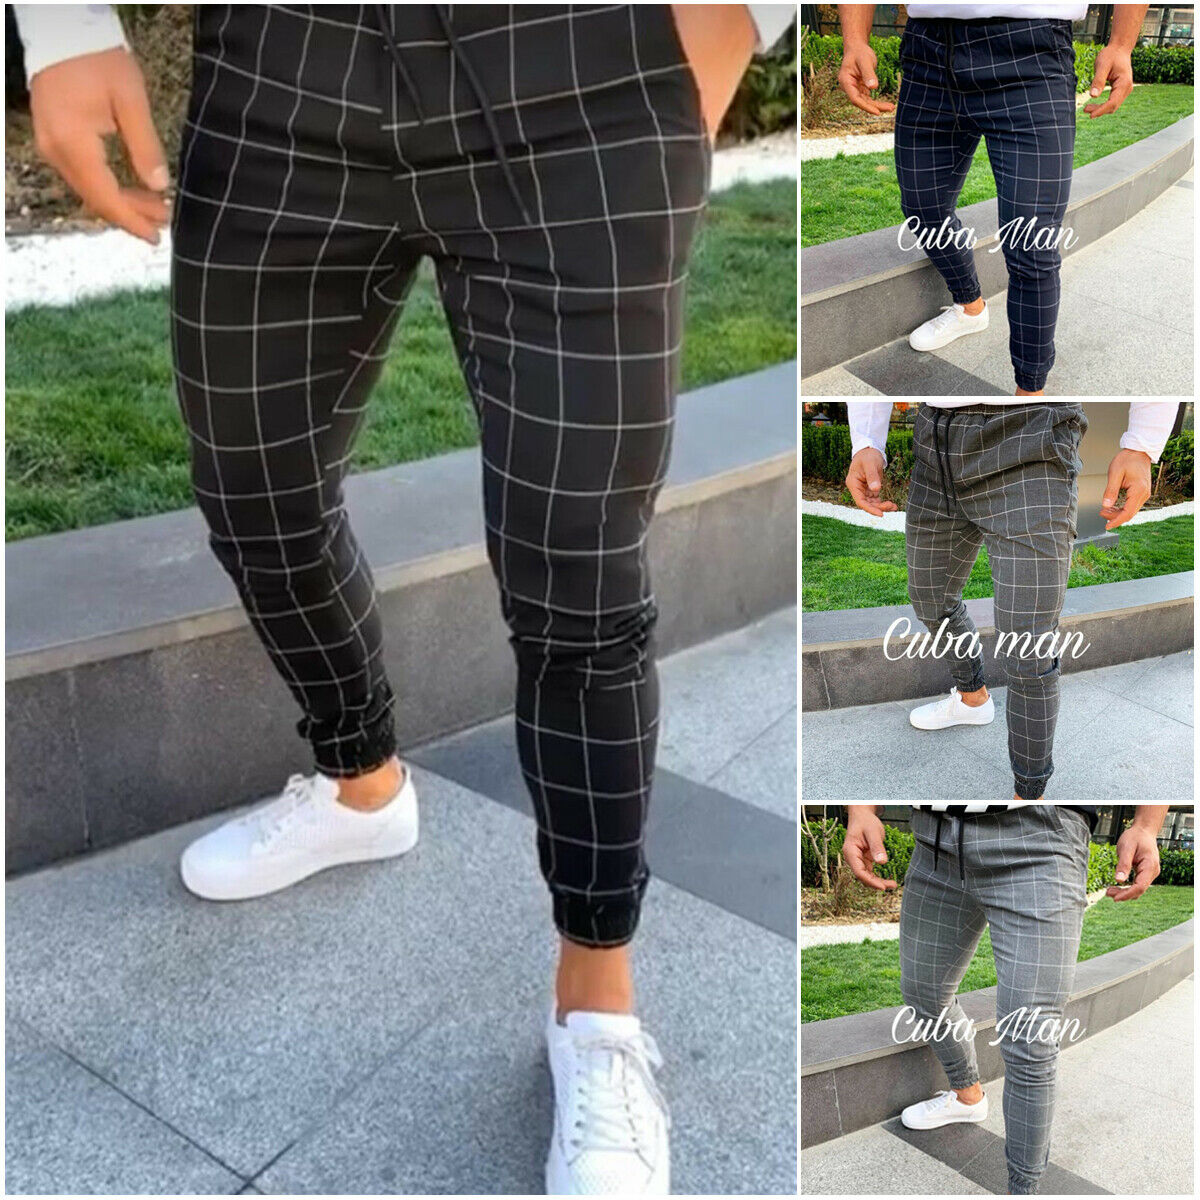 Hot Men's Sport Pants Long Plaid Tracksuit Skinny Elastic Fit Workout Joggers Casual Sweatpants Male Casual Trousers M-3XL